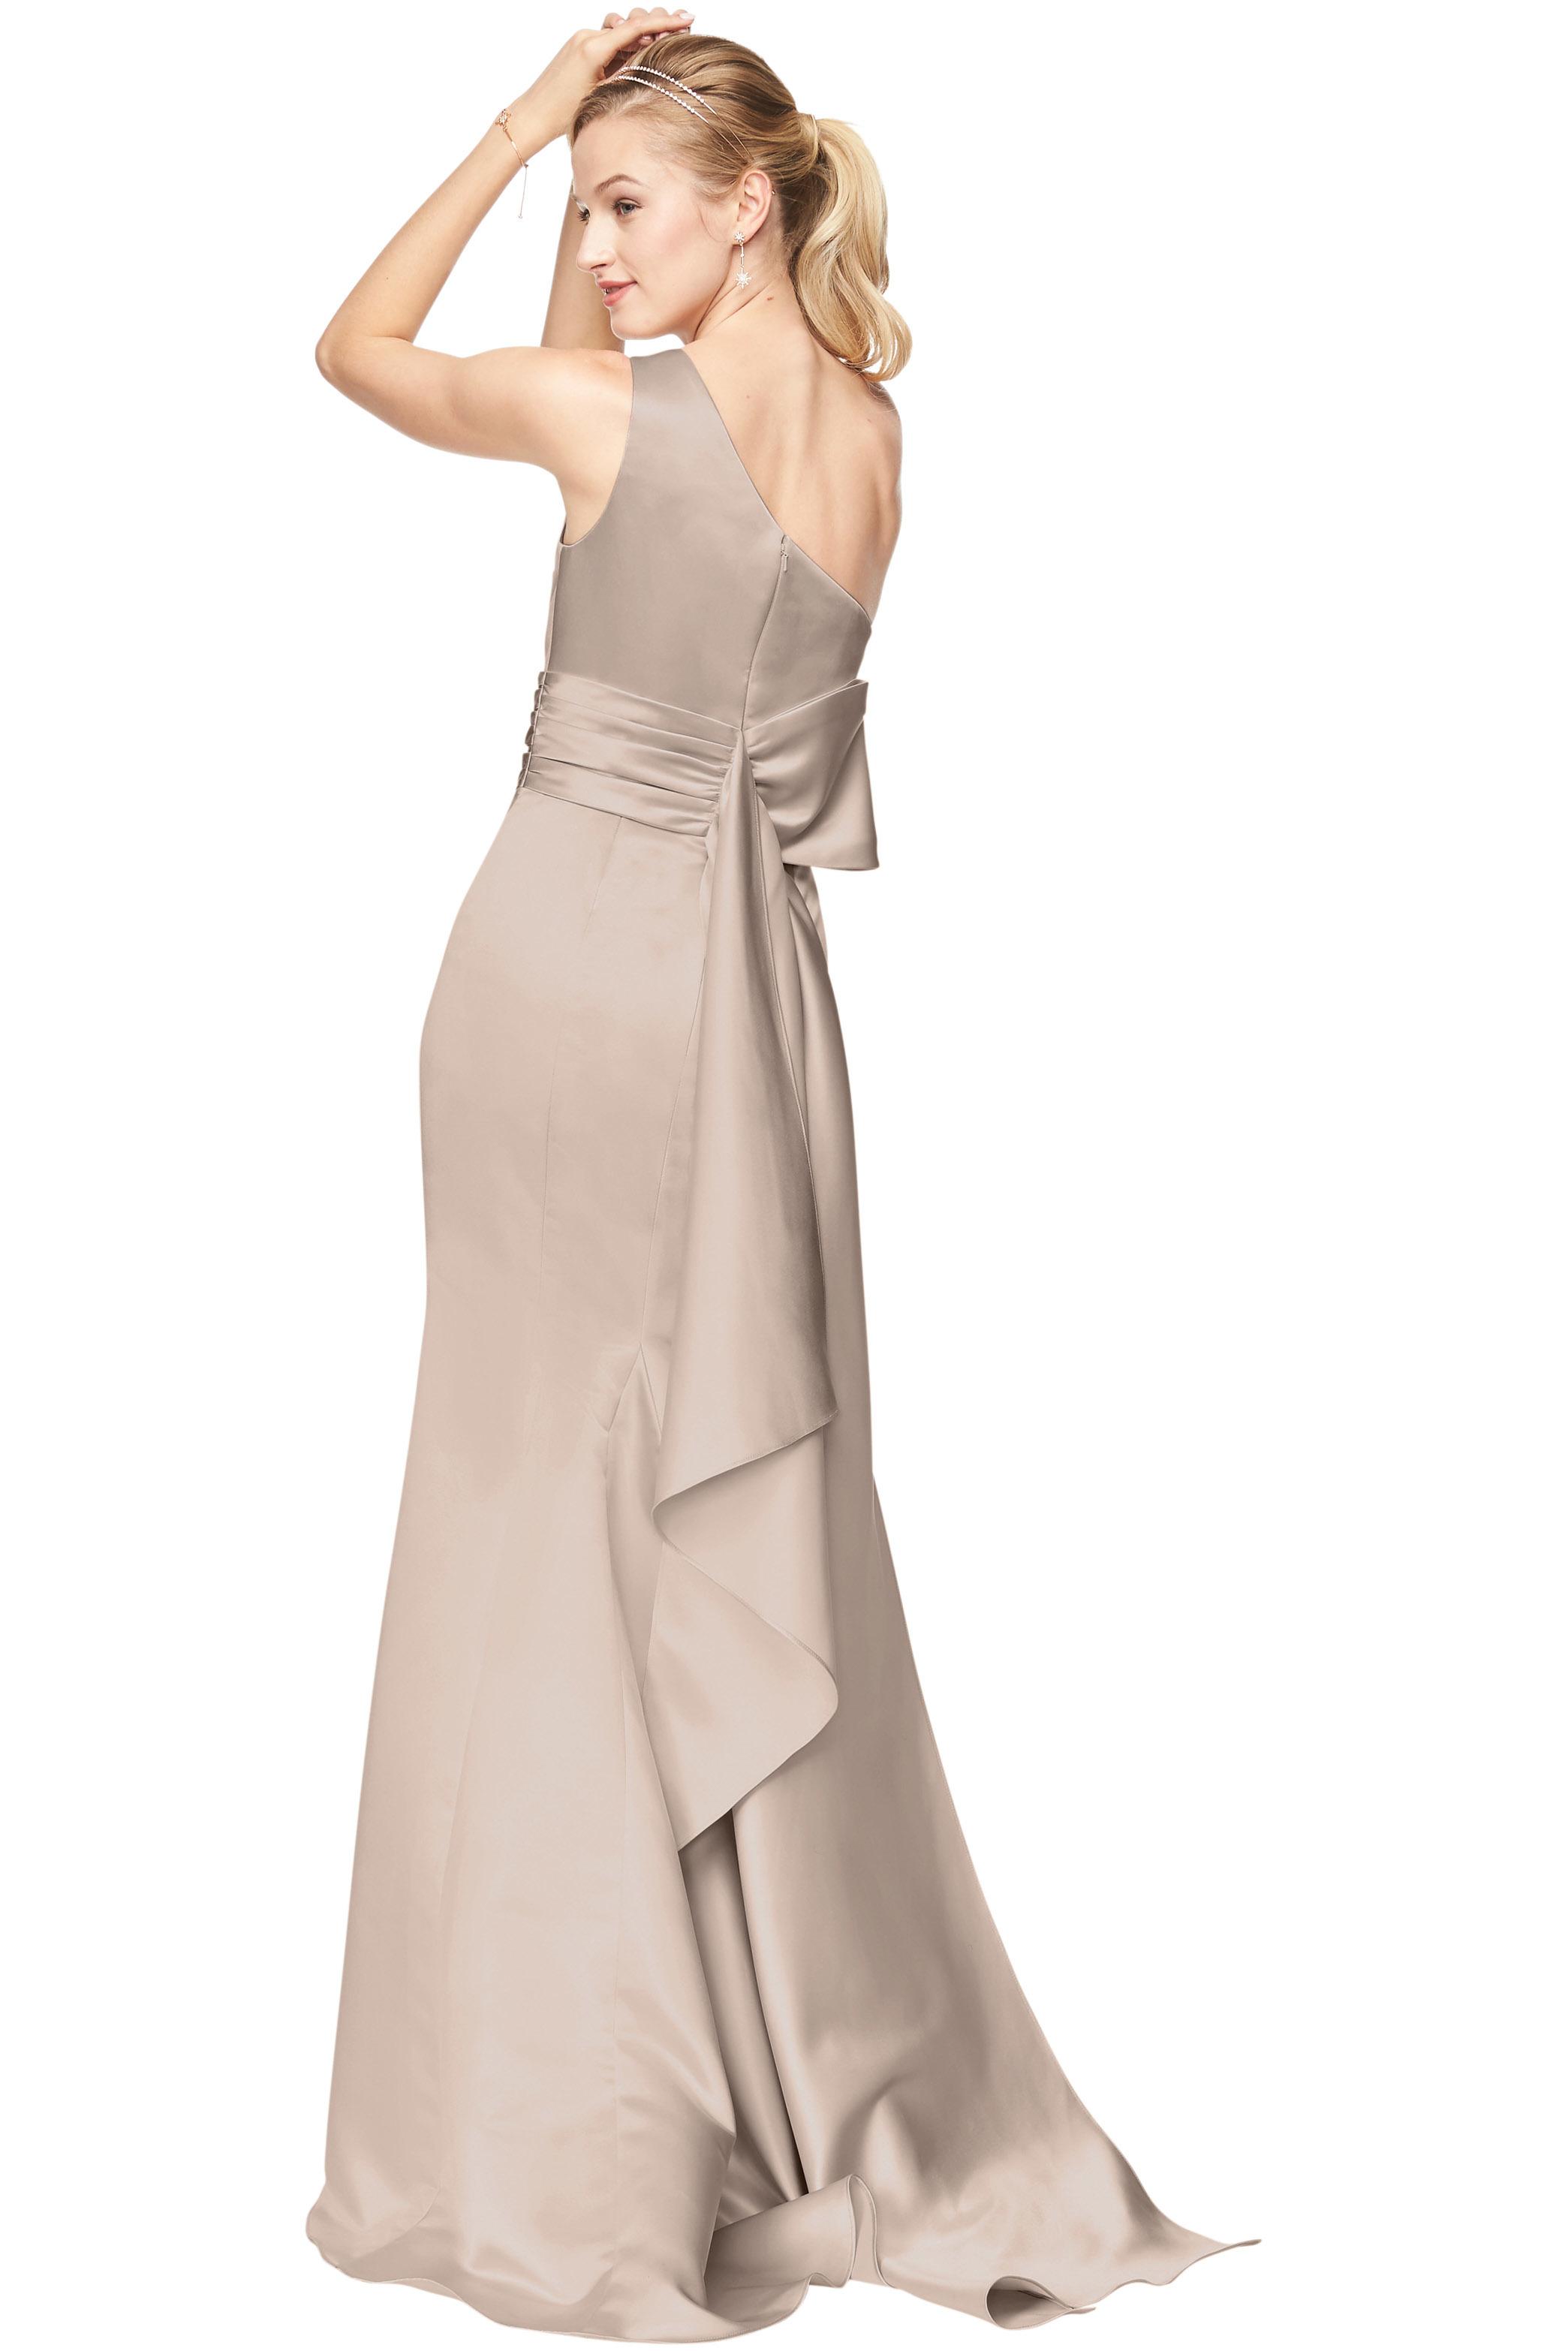 Bill Levkoff EURO CAMEL Euro Satin One Shoulder A-Line gown, $210.00 Back